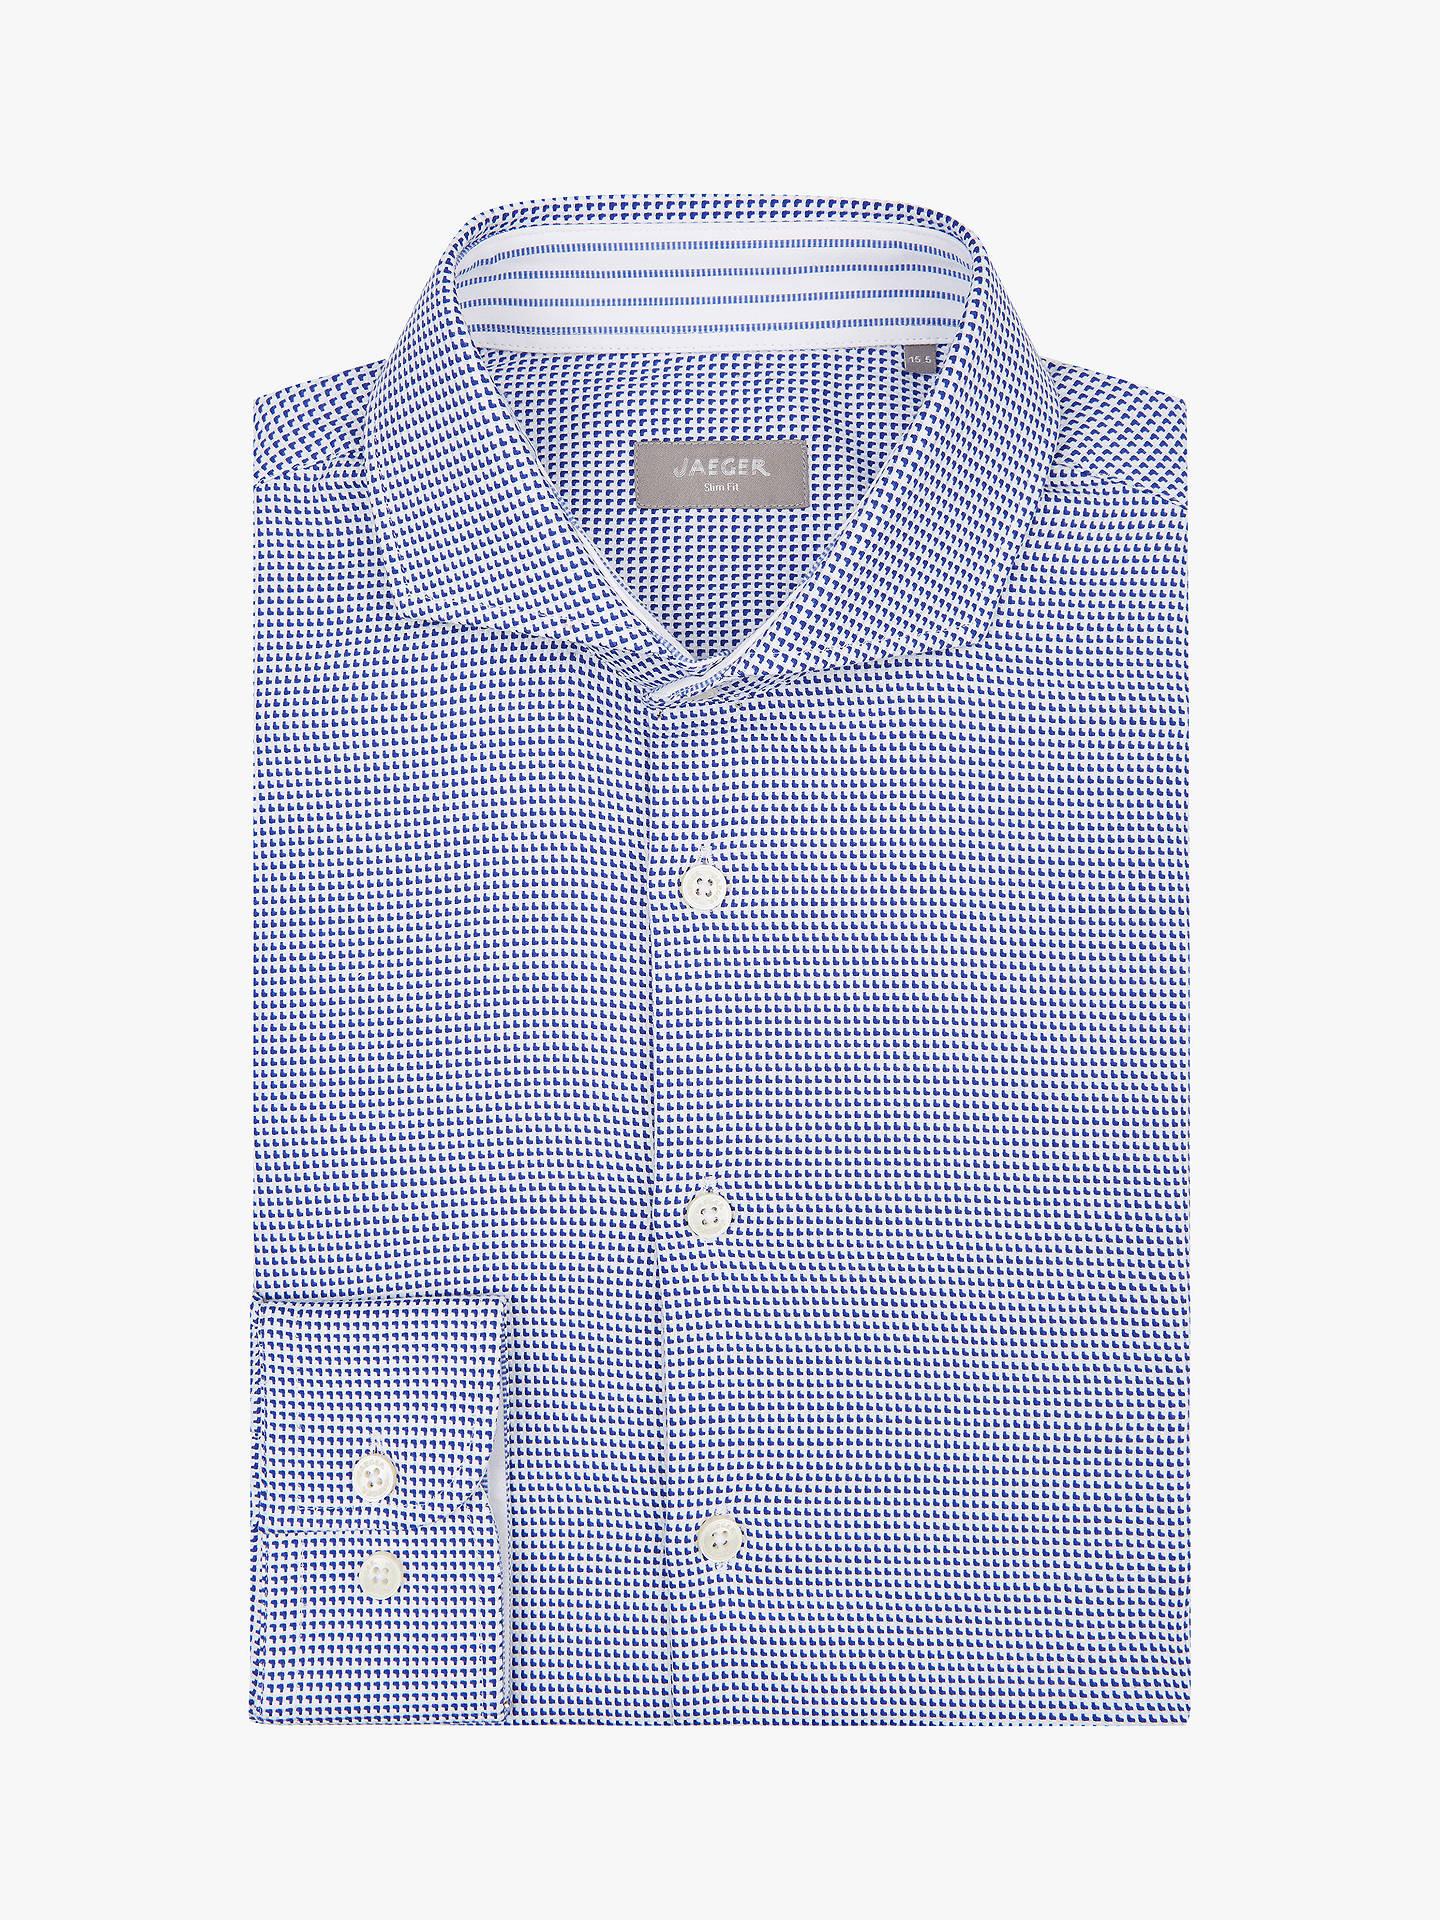 7c3104fbe440 Buy Jaeger Patterned Texture Slim Fit Shirt, Indigo, 14.5 Online at  johnlewis.com ...